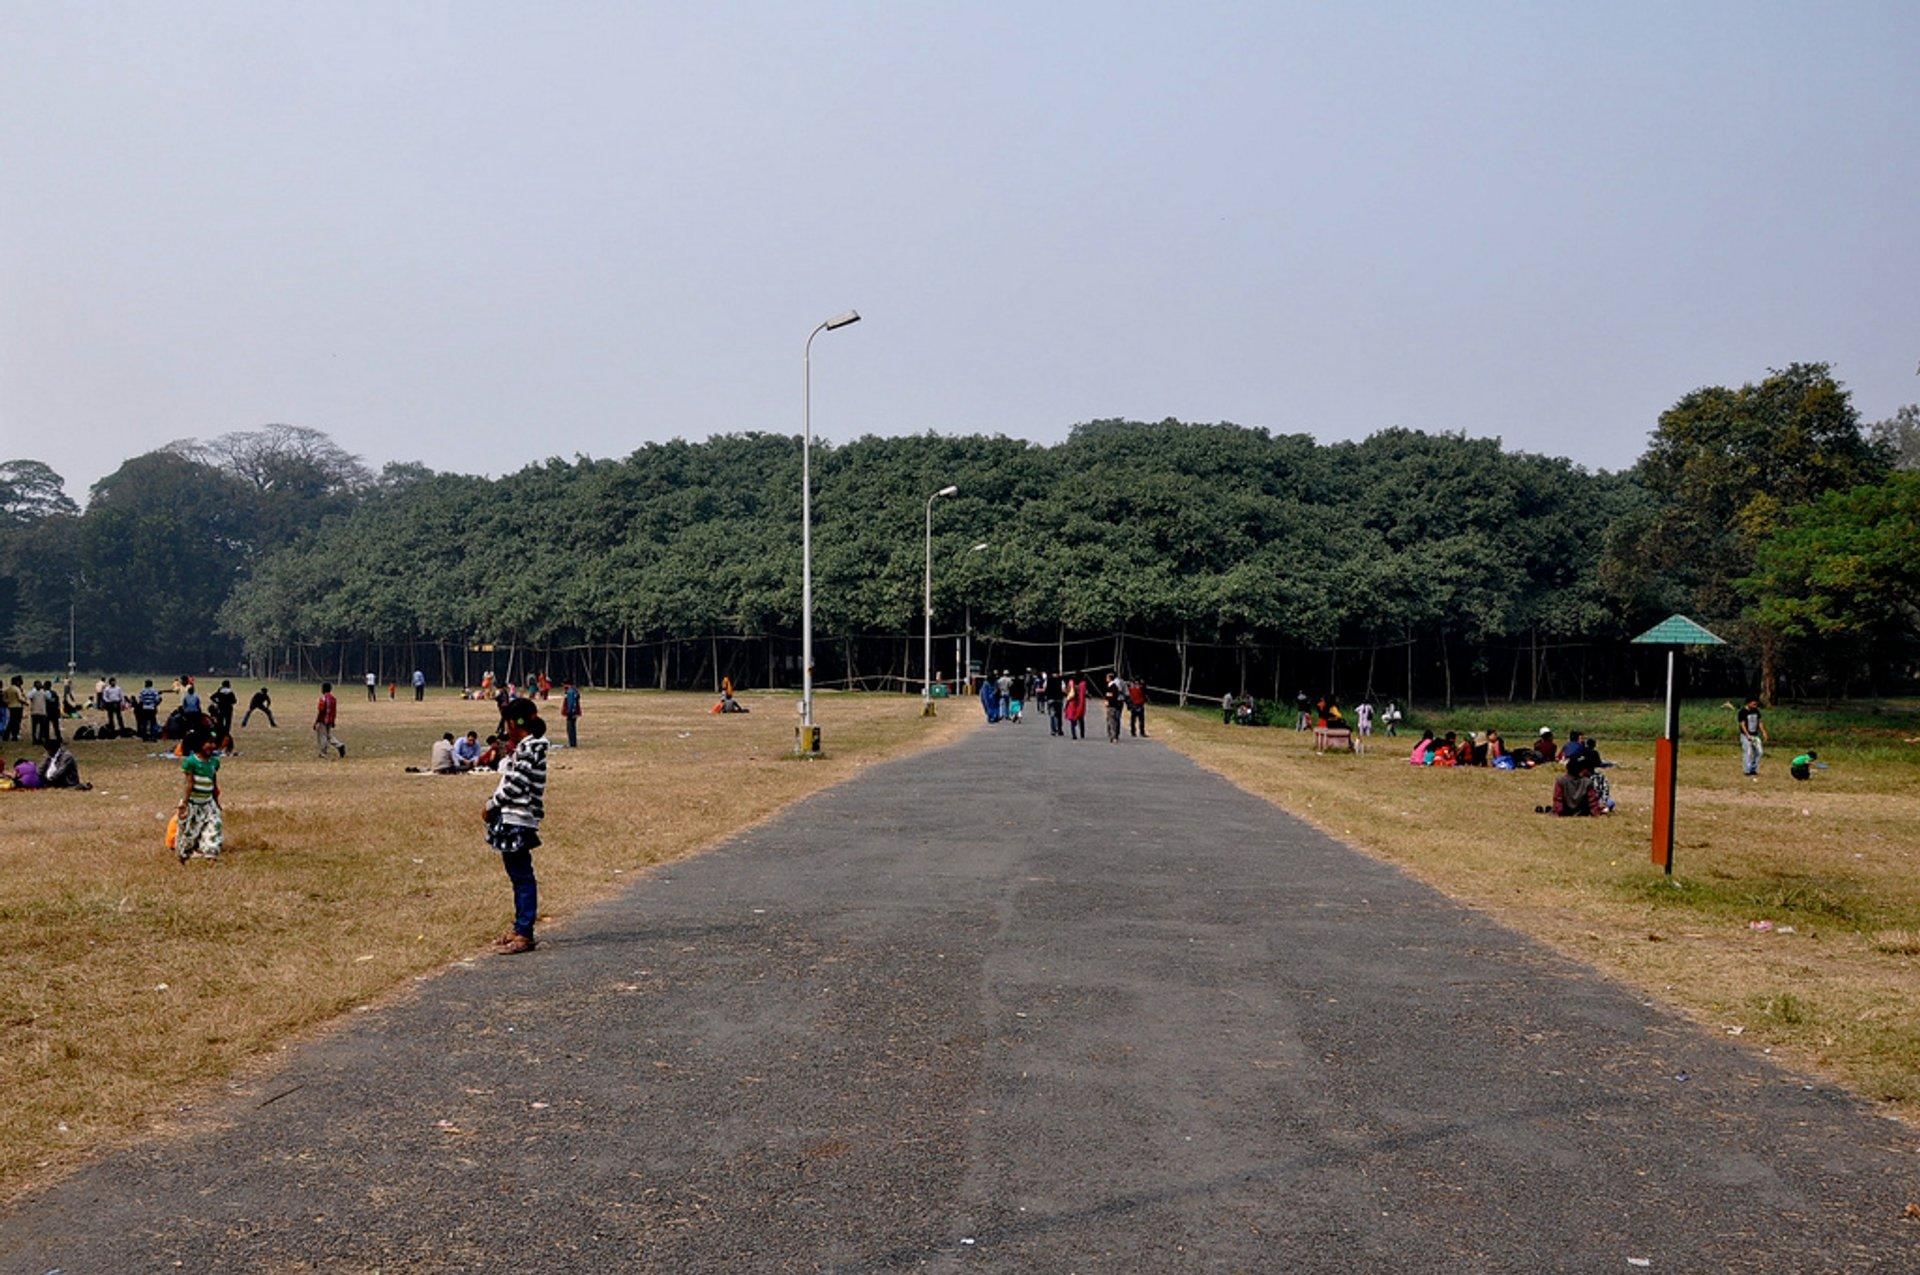 Great Banyan Tree in India - Best Season 2020